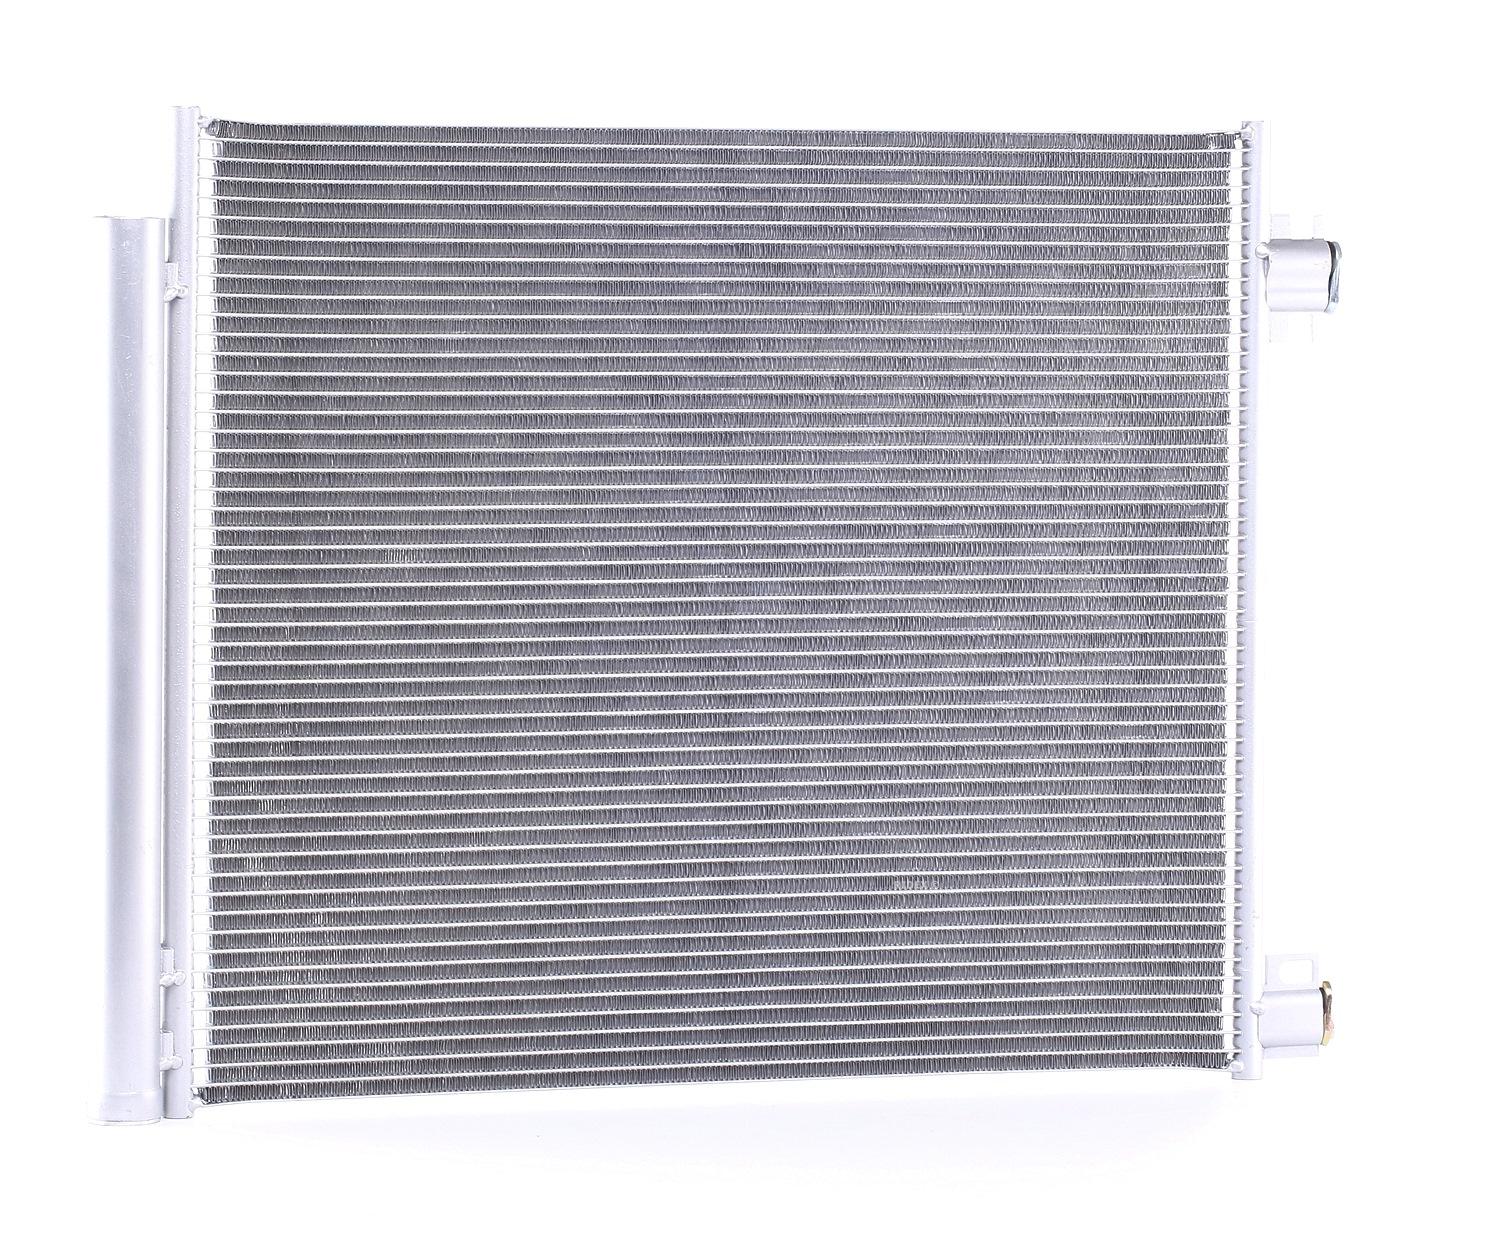 RENAULT ESPACE 2021 Kondensator Klimaanlage - Original RIDEX 448C0243 Kältemittel: R 134a, Netzmaße: 565 x 464 x 12 mm